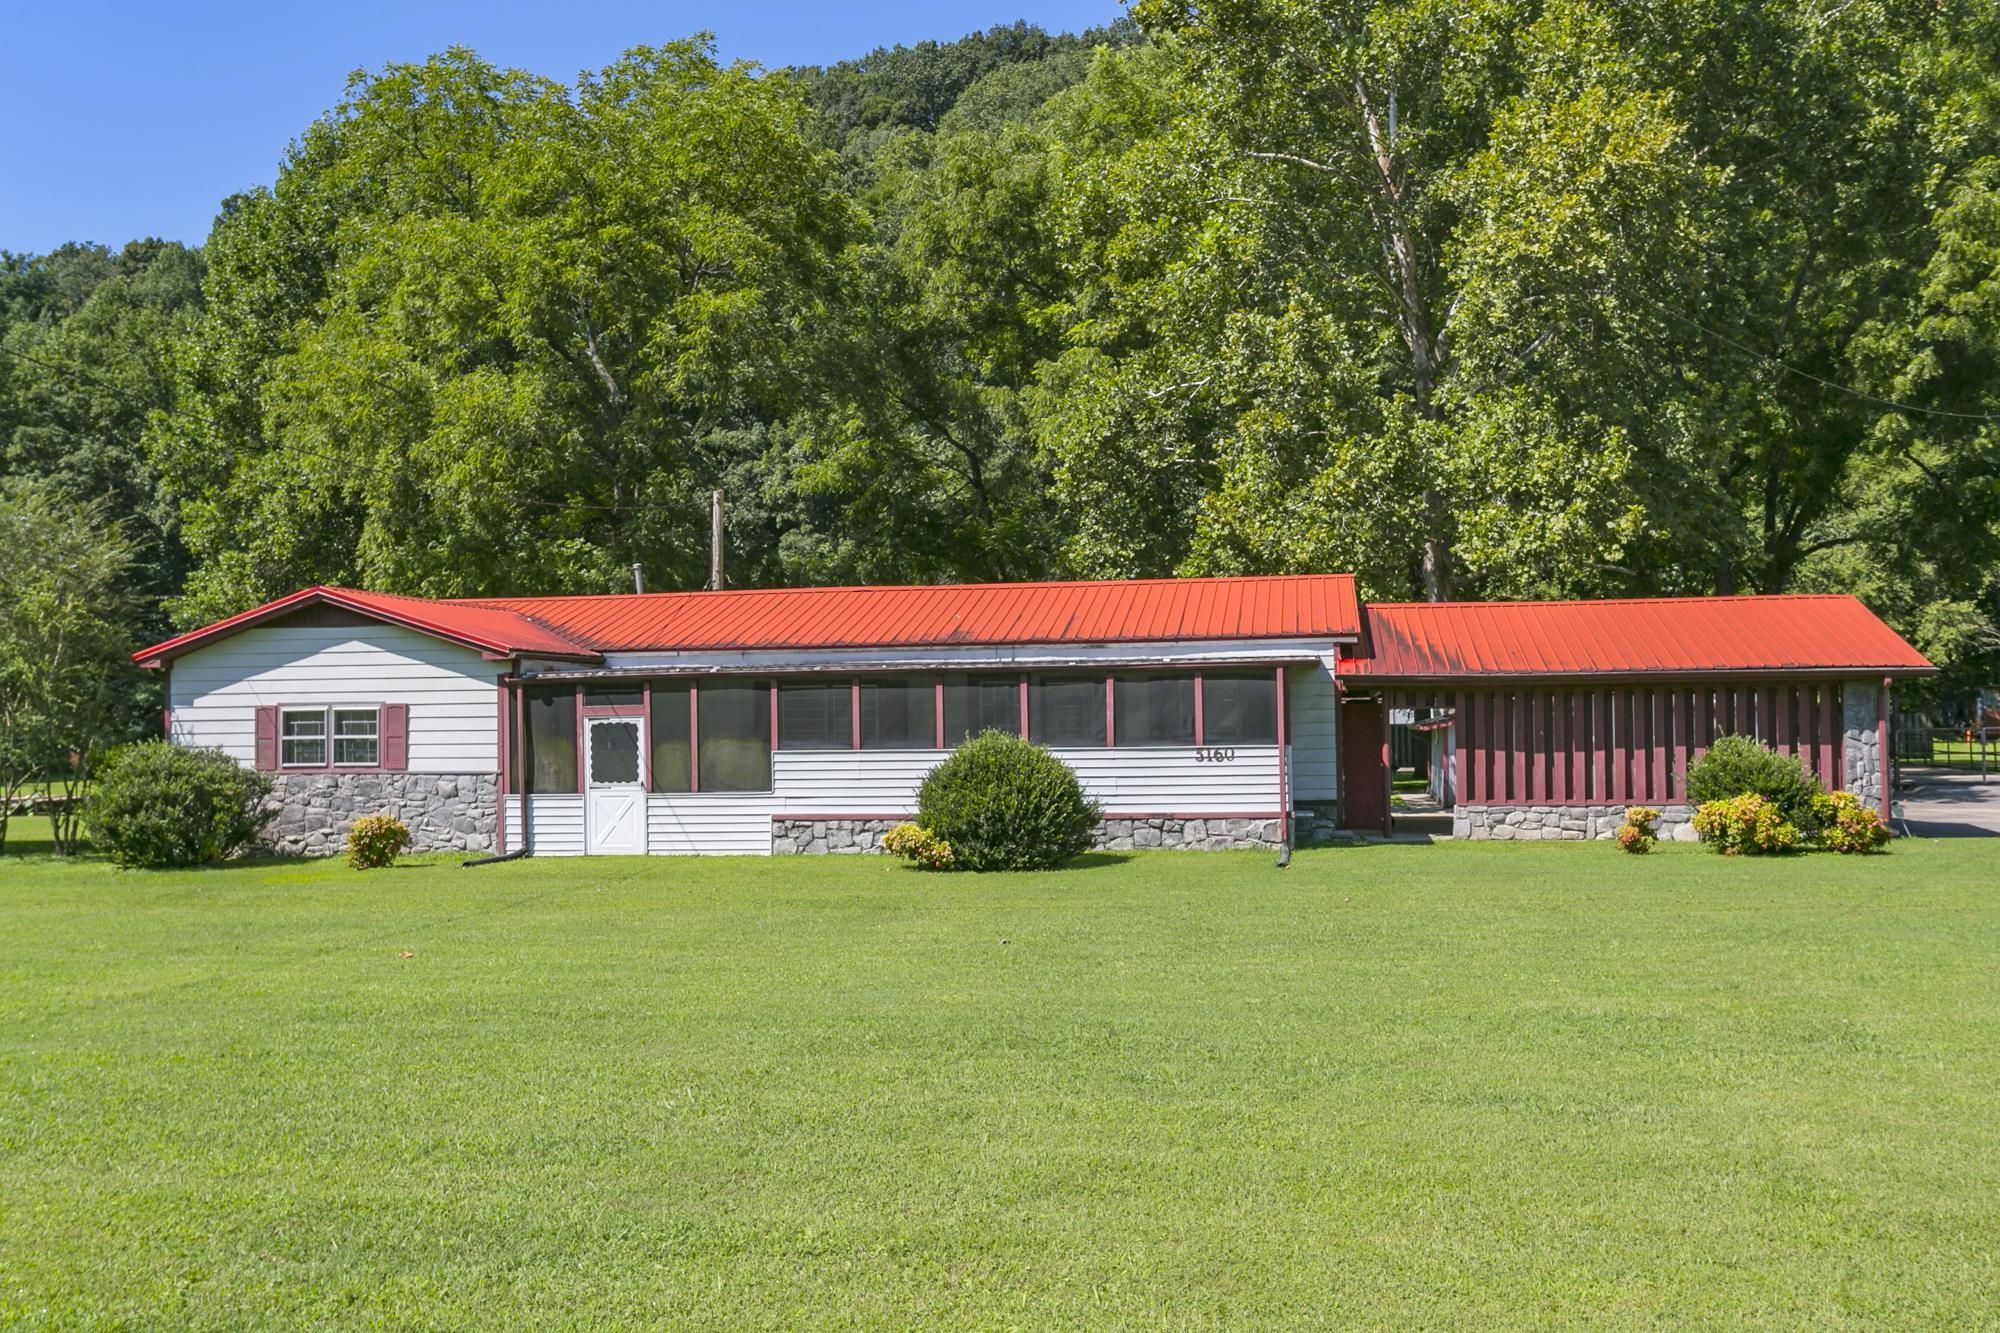 5160 Whites Creek Pike, Whites Creek, TN 37189 - Whites Creek, TN real estate listing